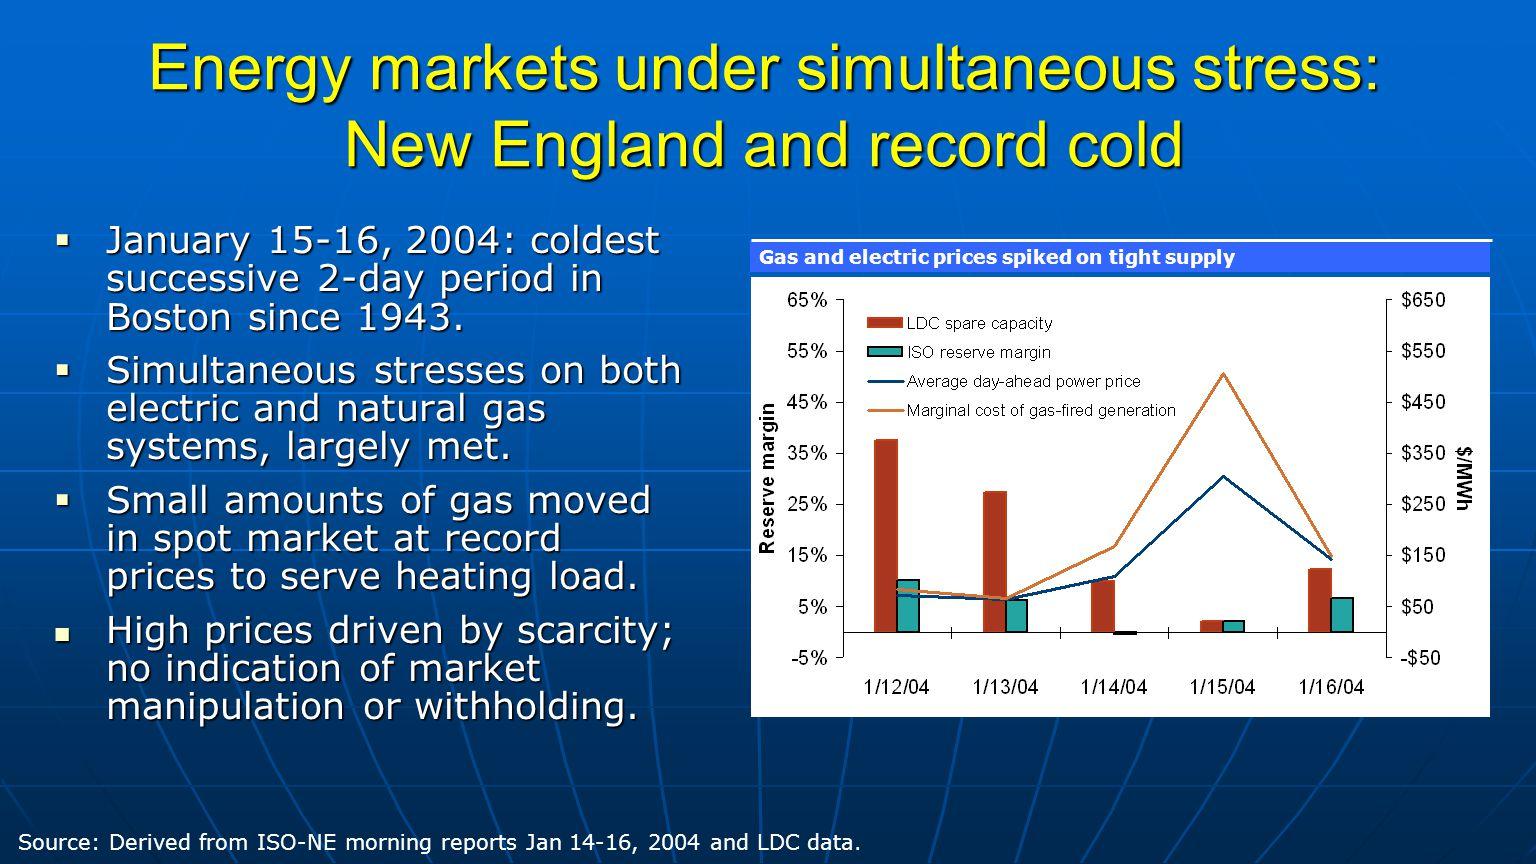  January 15-16, 2004: coldest successive 2-day period in Boston since 1943.